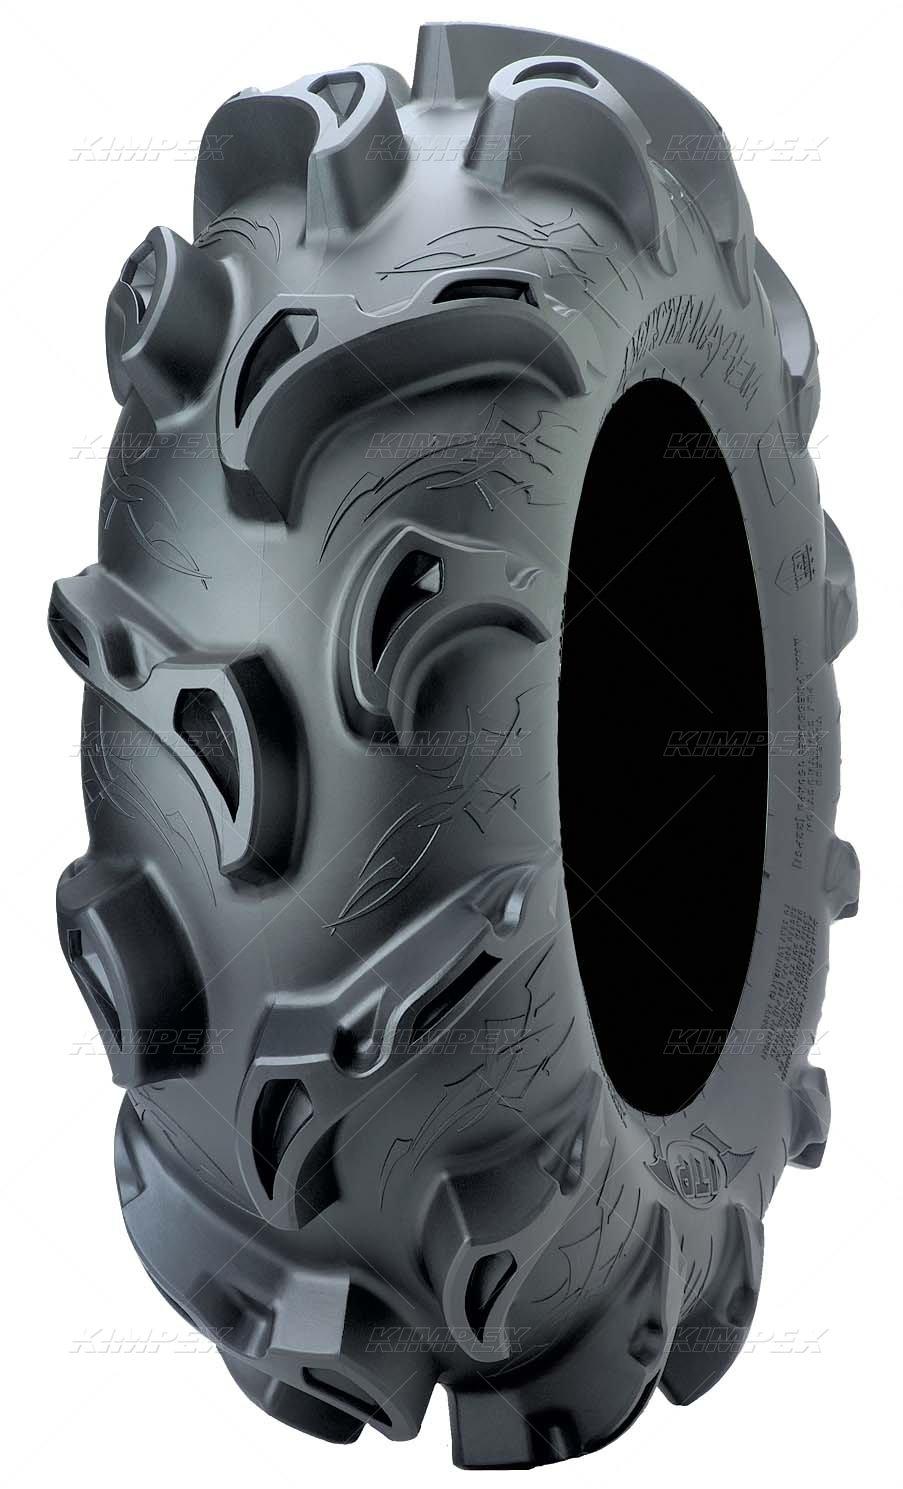 ITP Monster Mayhem Utility ATV/UTV Rear Tire 30X10-14 (6P0104)